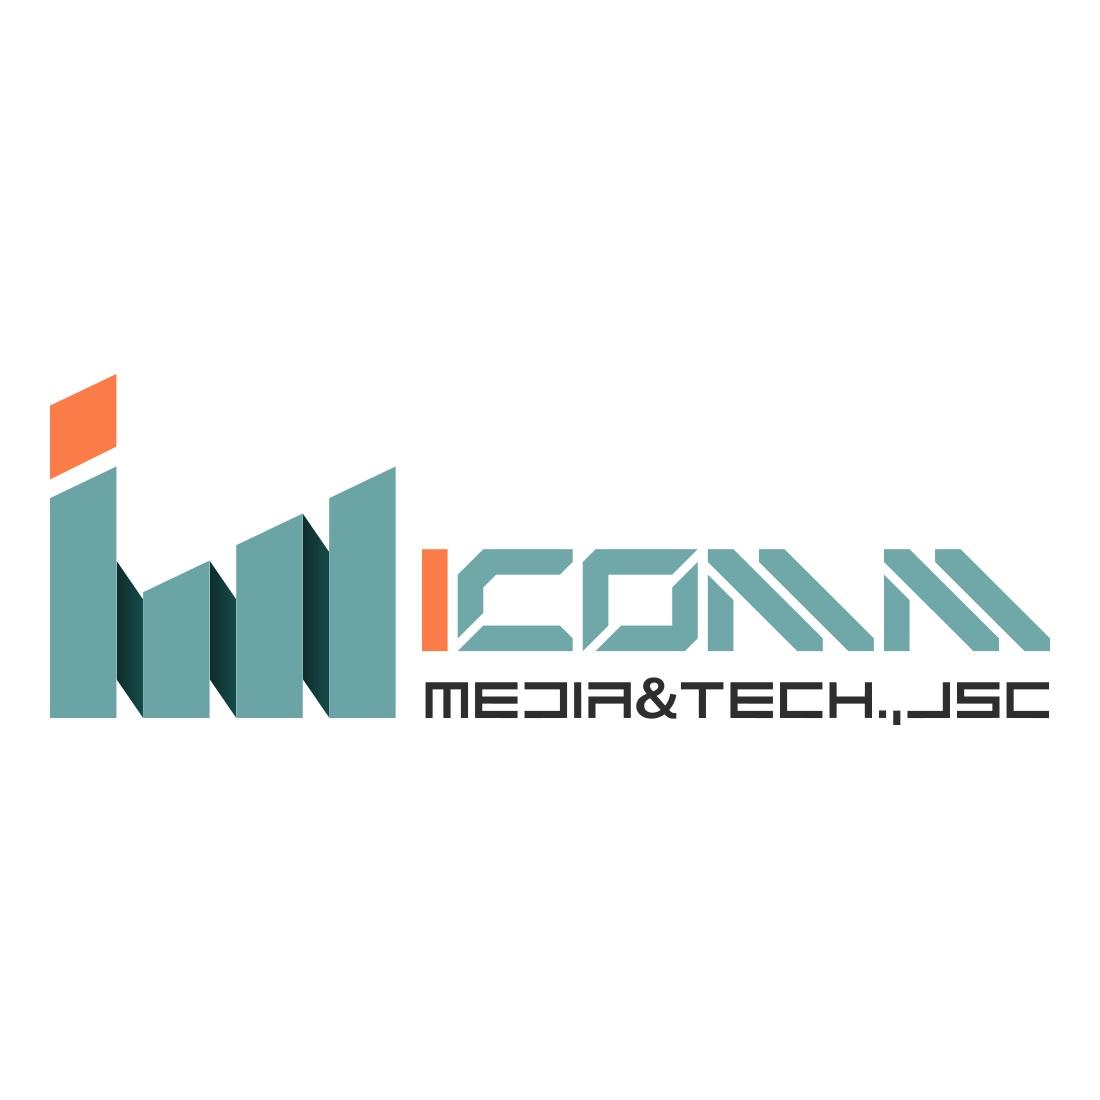 iCOMM Media & Tech, Jsc